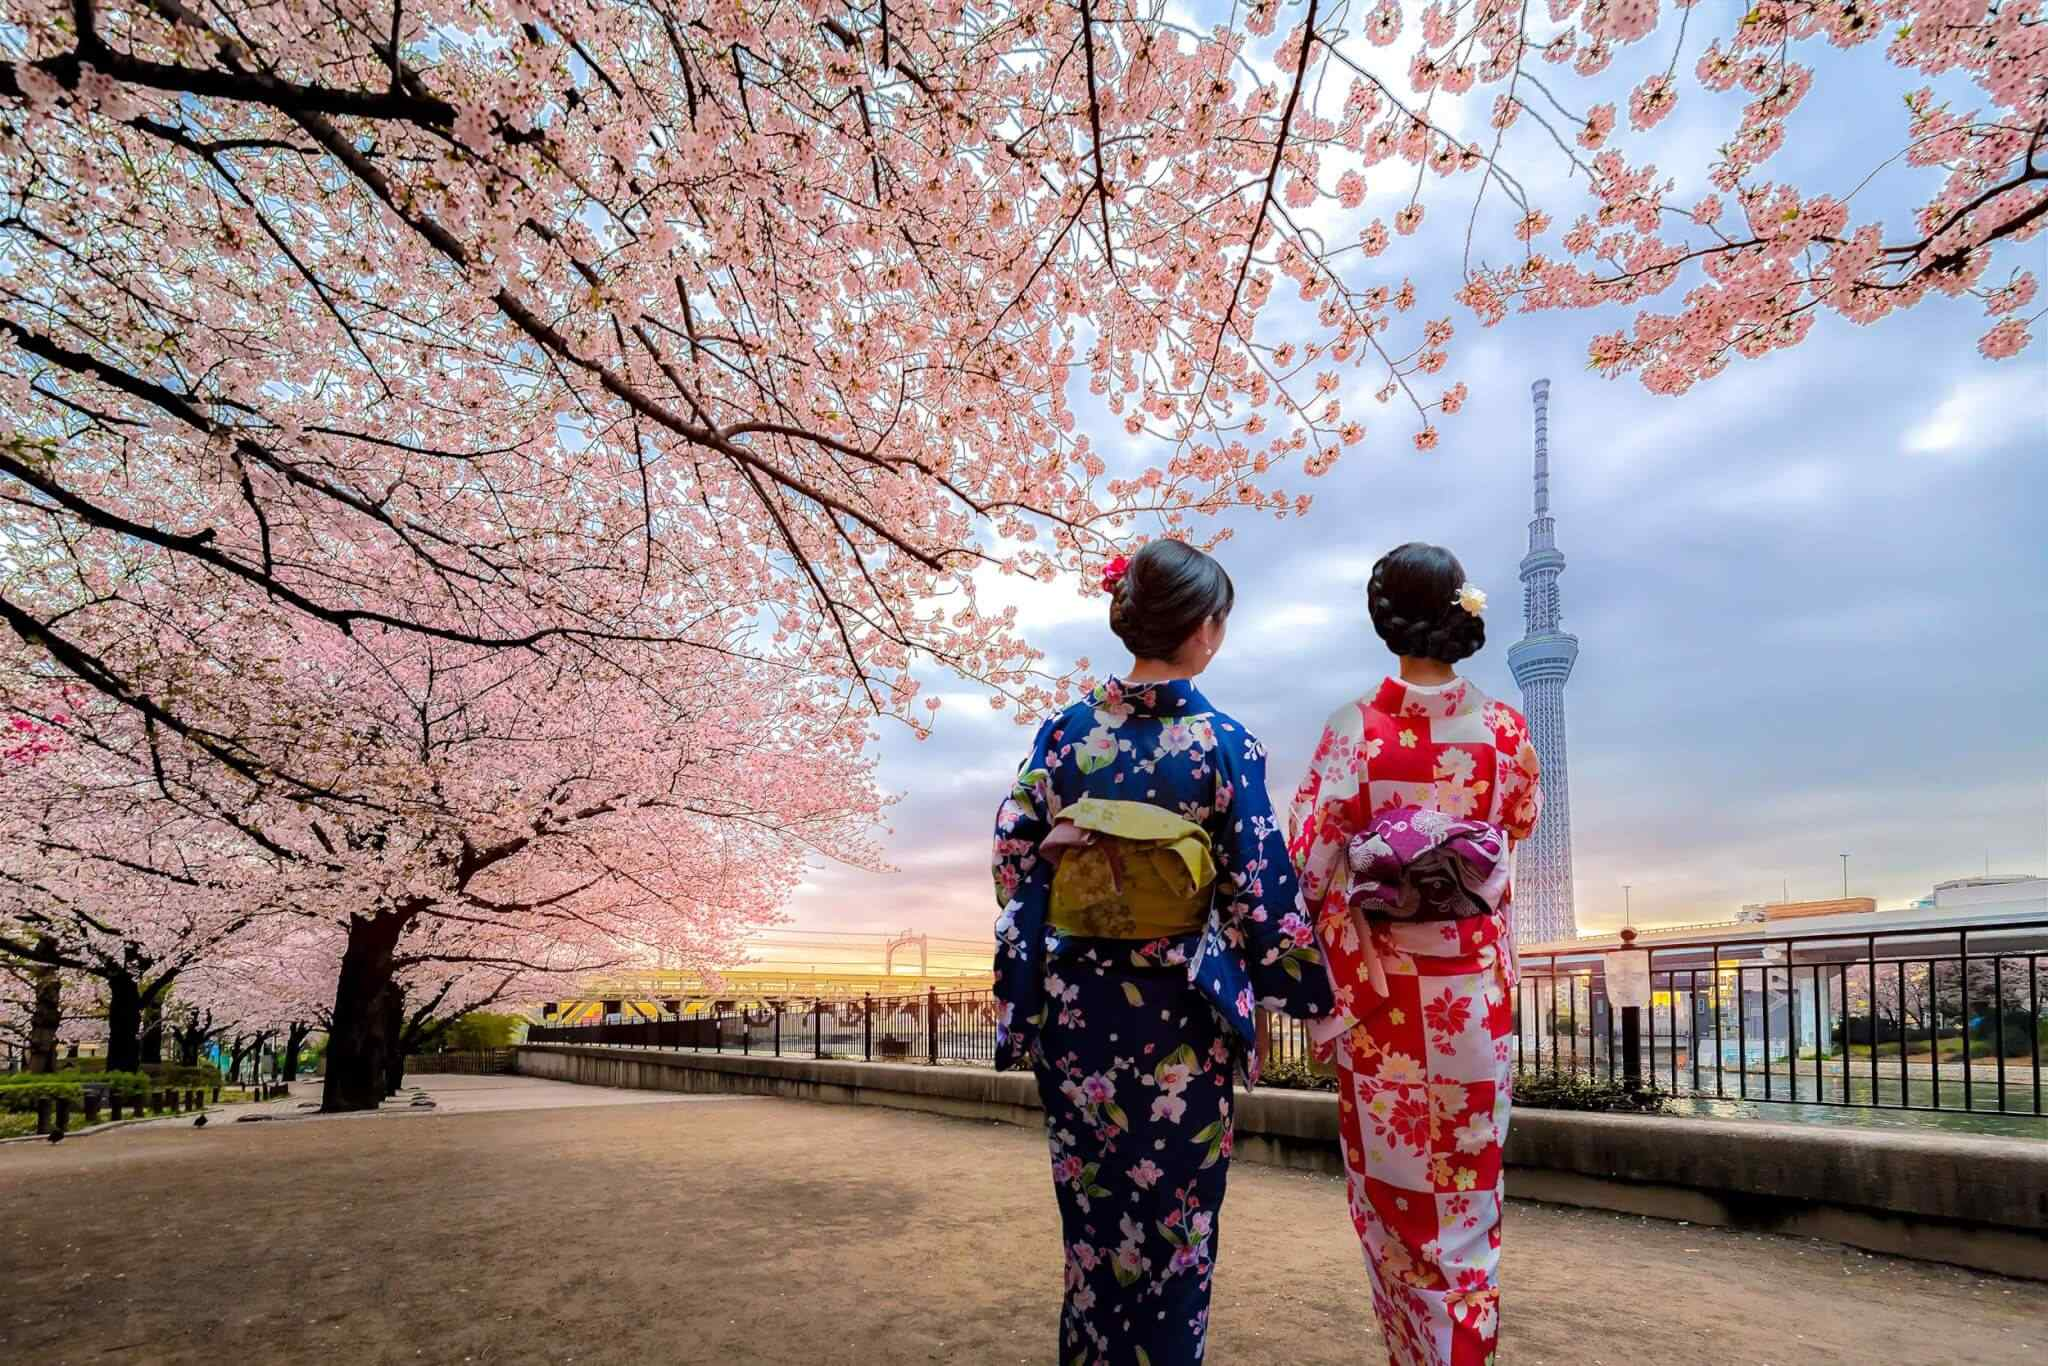 https://www.iomdirectholidays.com/wp-content/uploads/2018/09/destination-tokyo-03.jpg